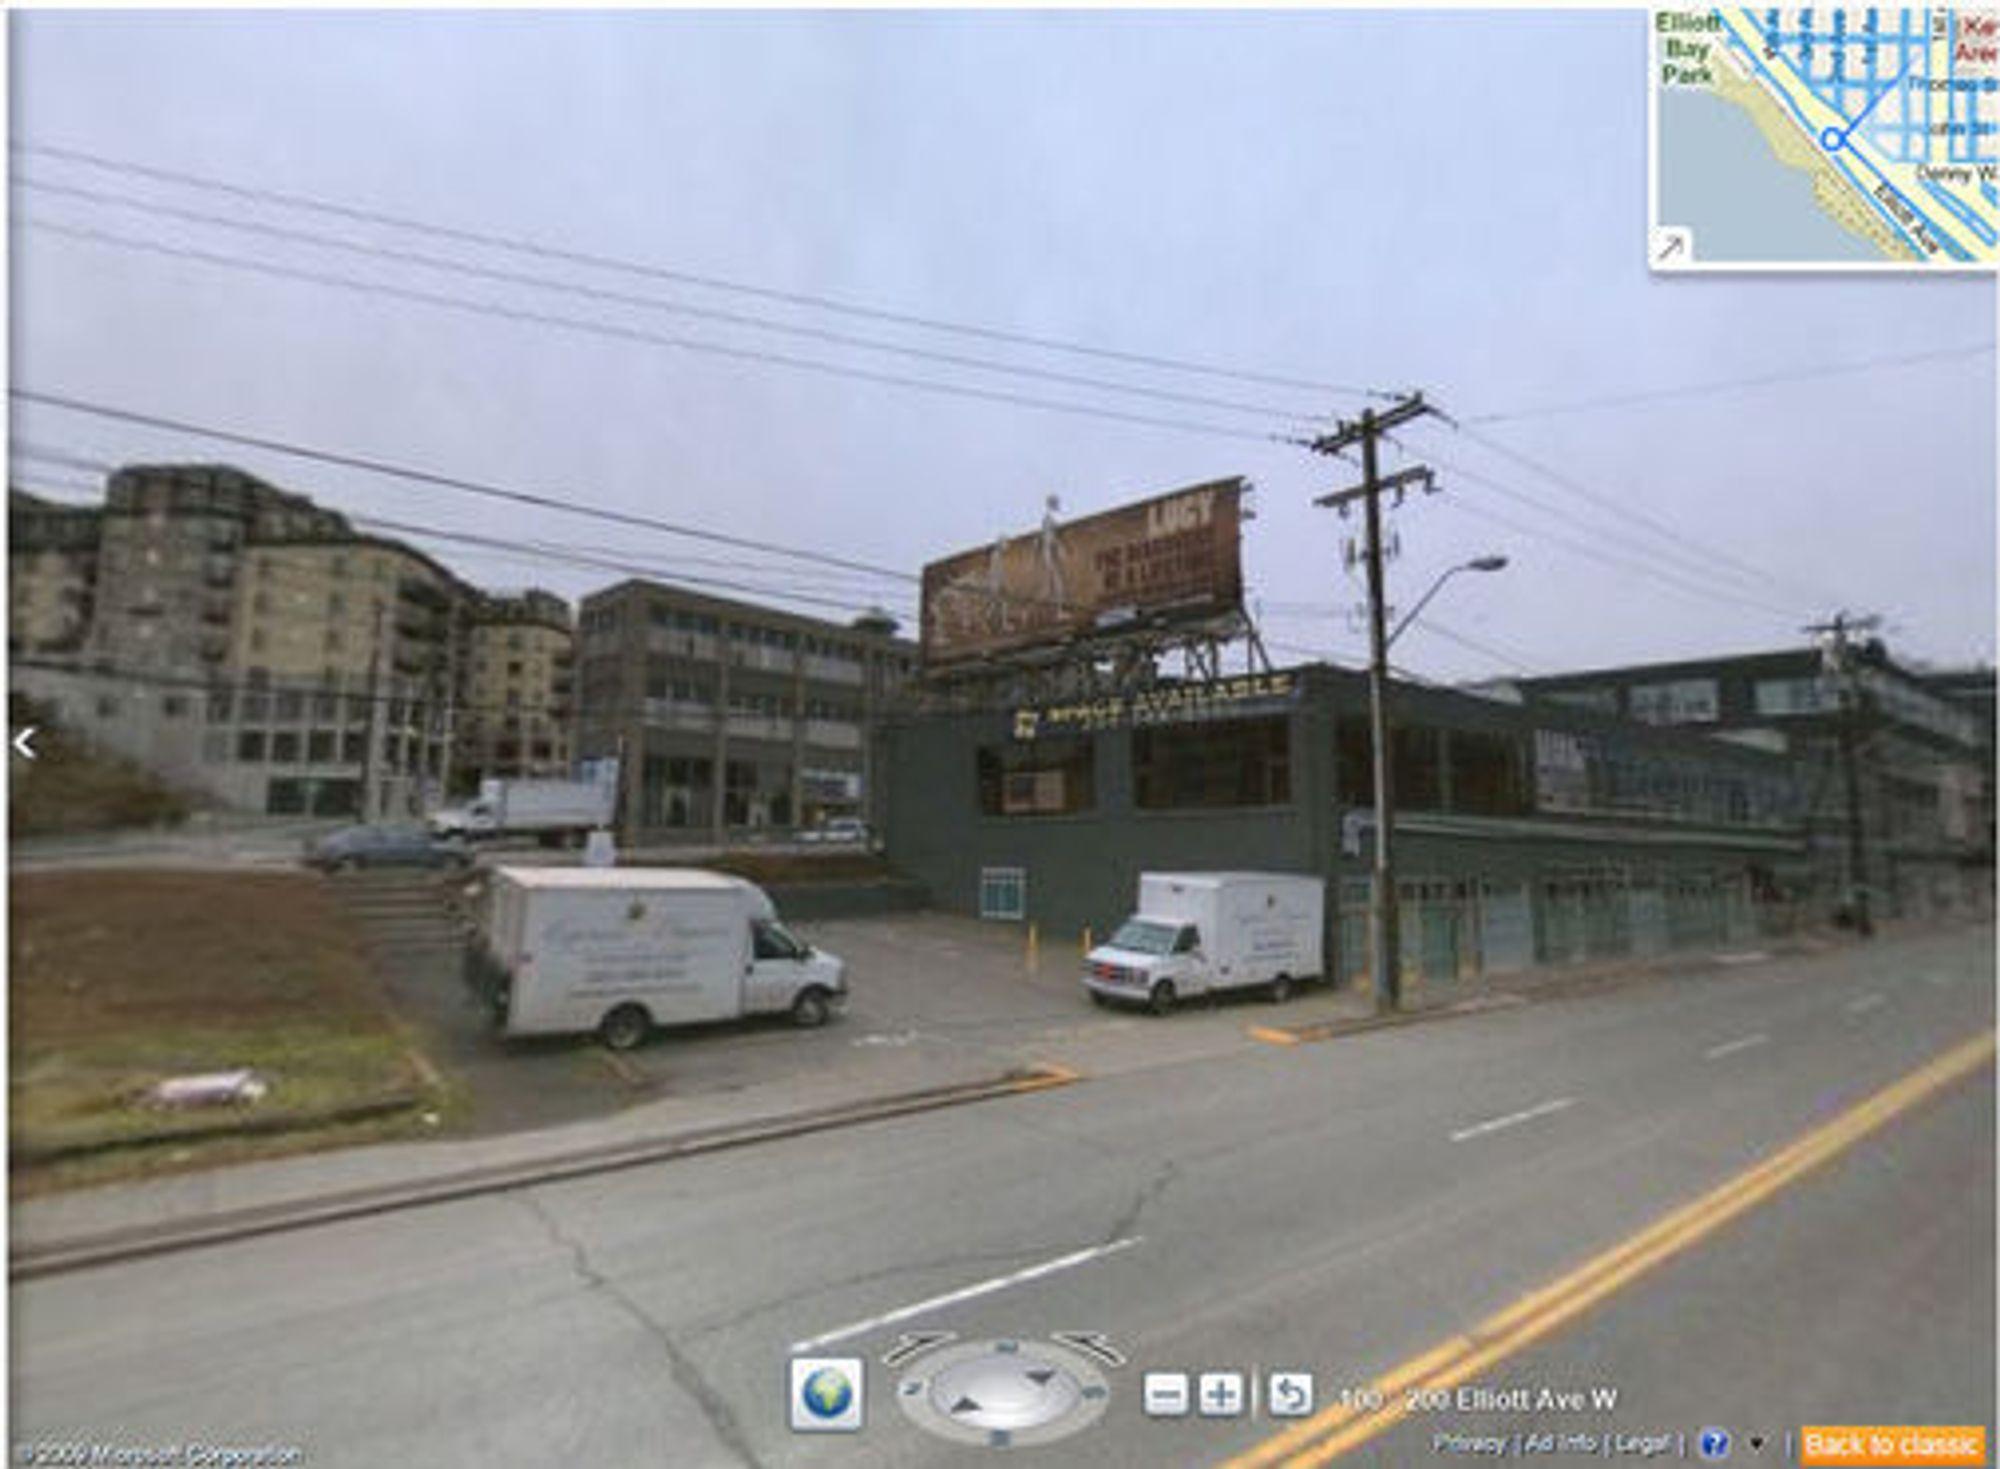 Bing Maps gatebilde fra Seattle uten Streetside Photos